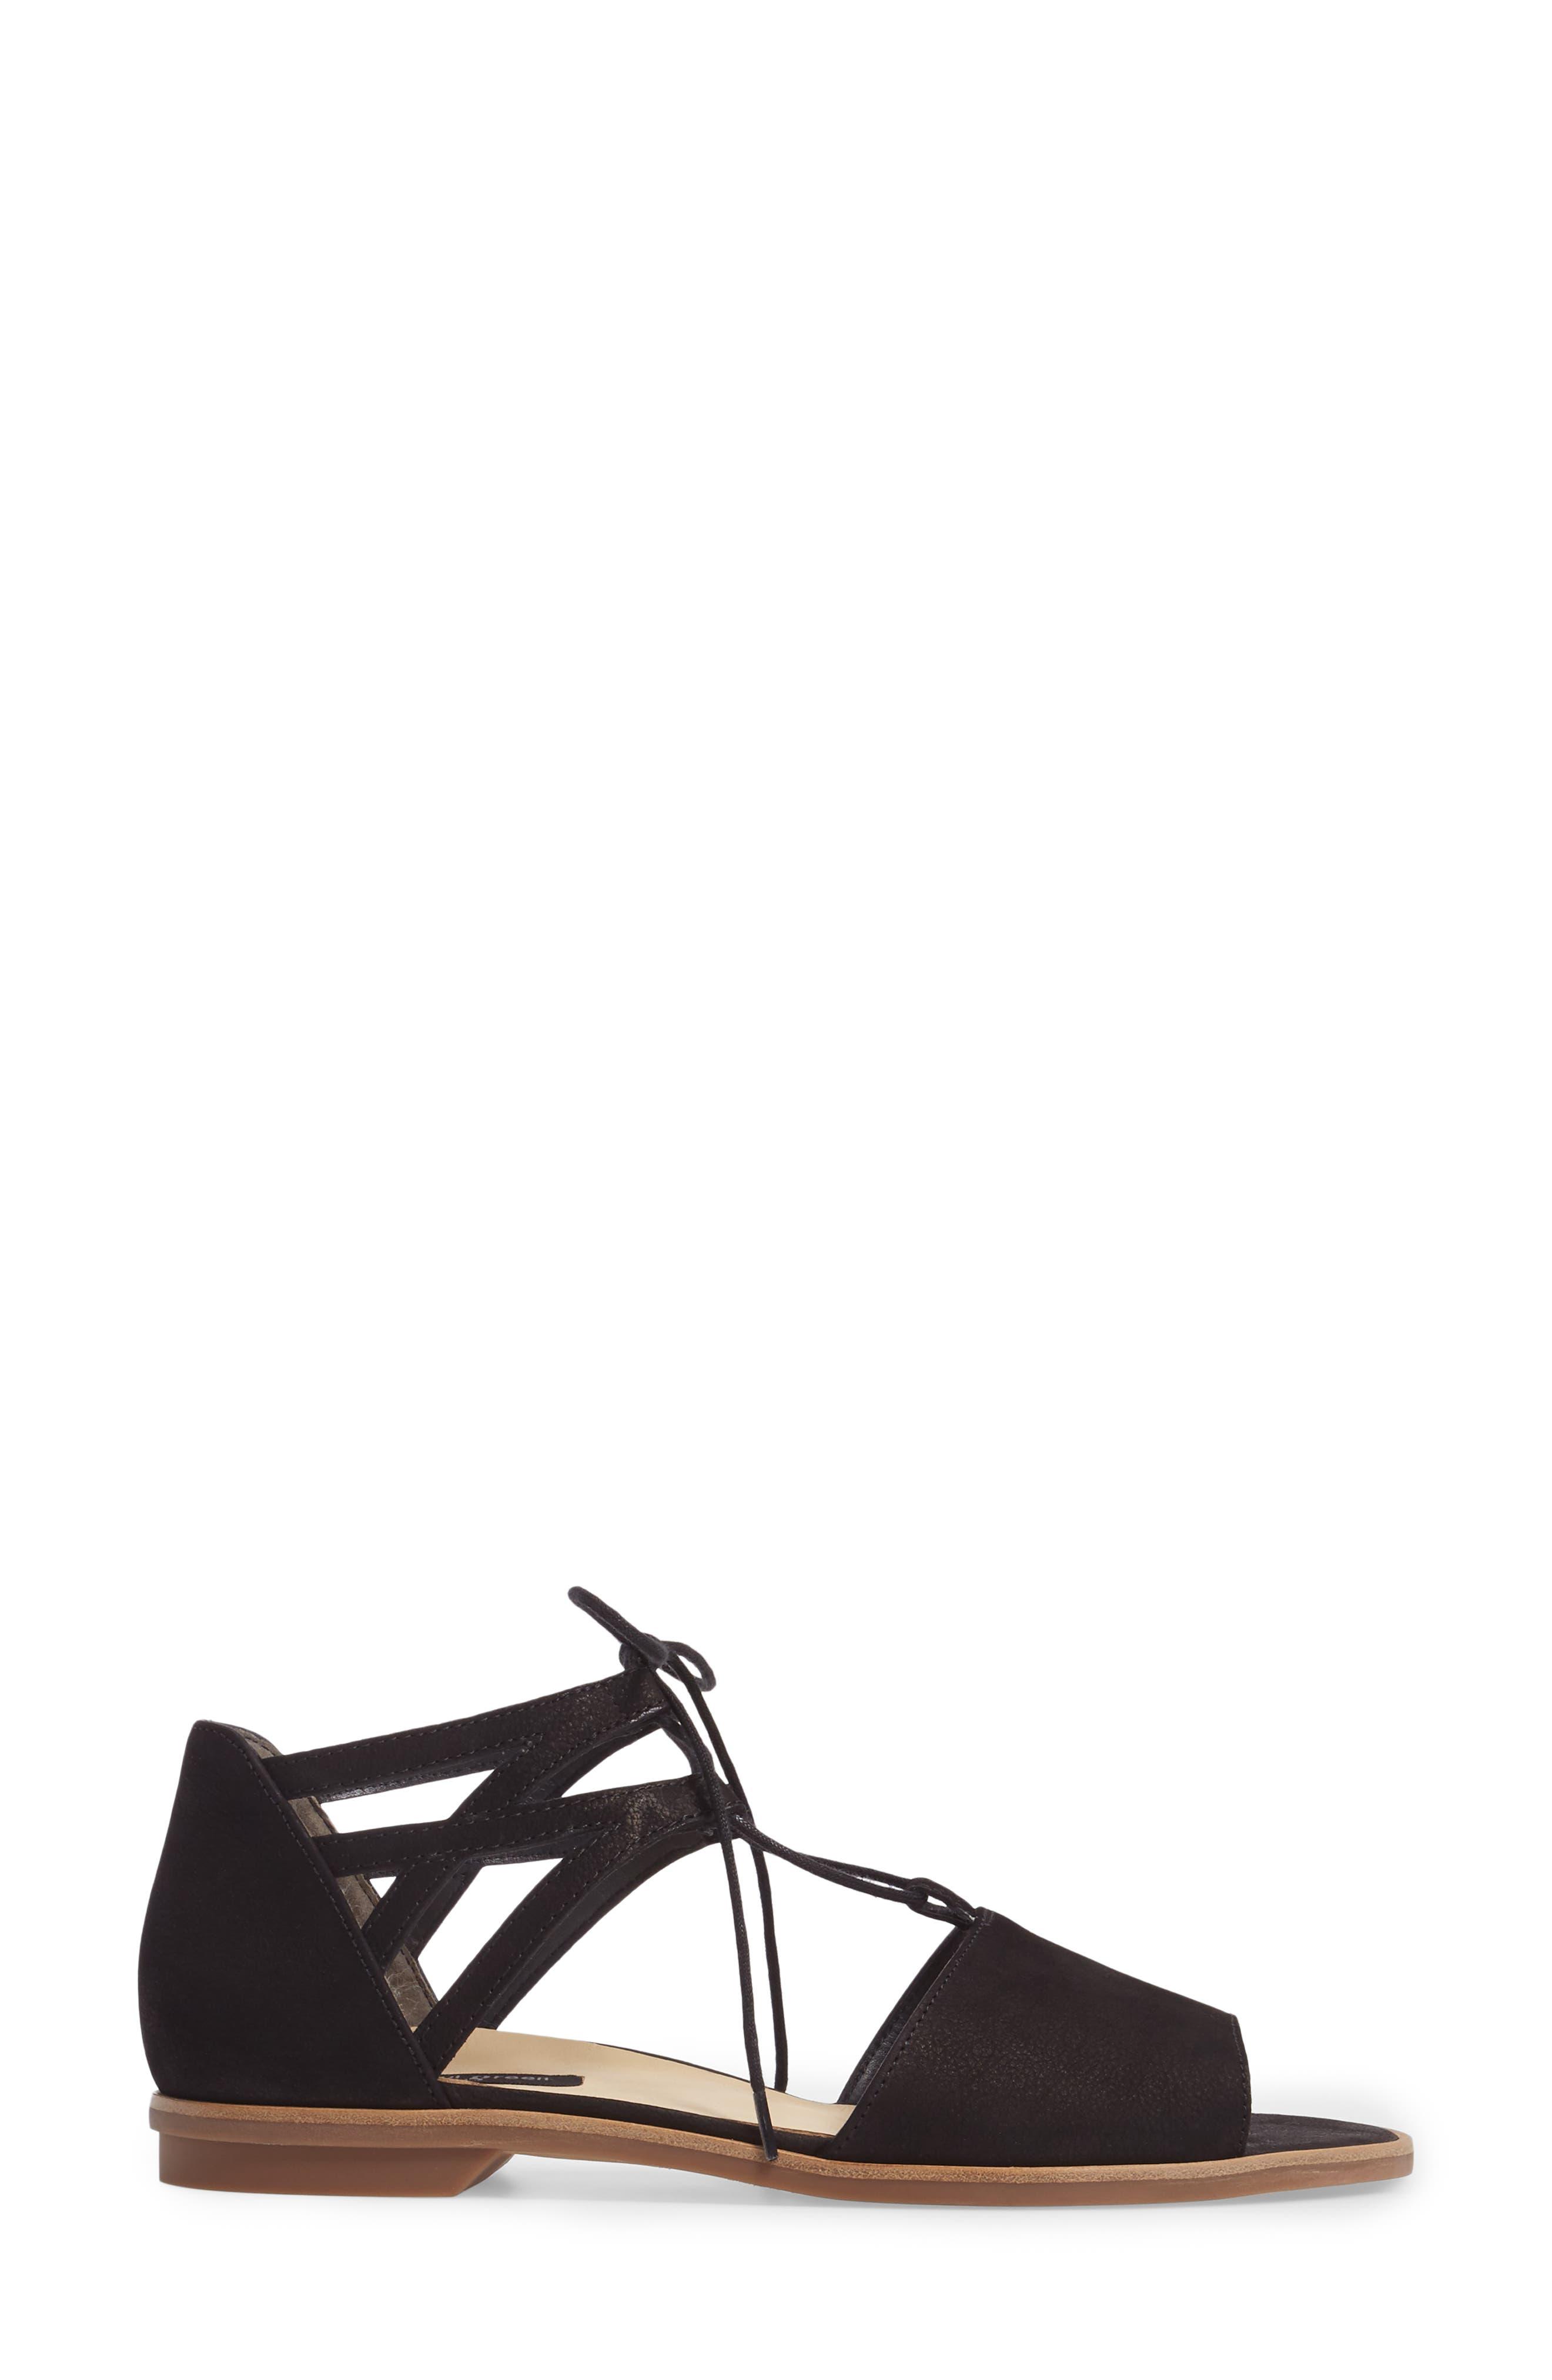 Alternate Image 3  - Paul Green Morea Lace-Up Sandal (Women)